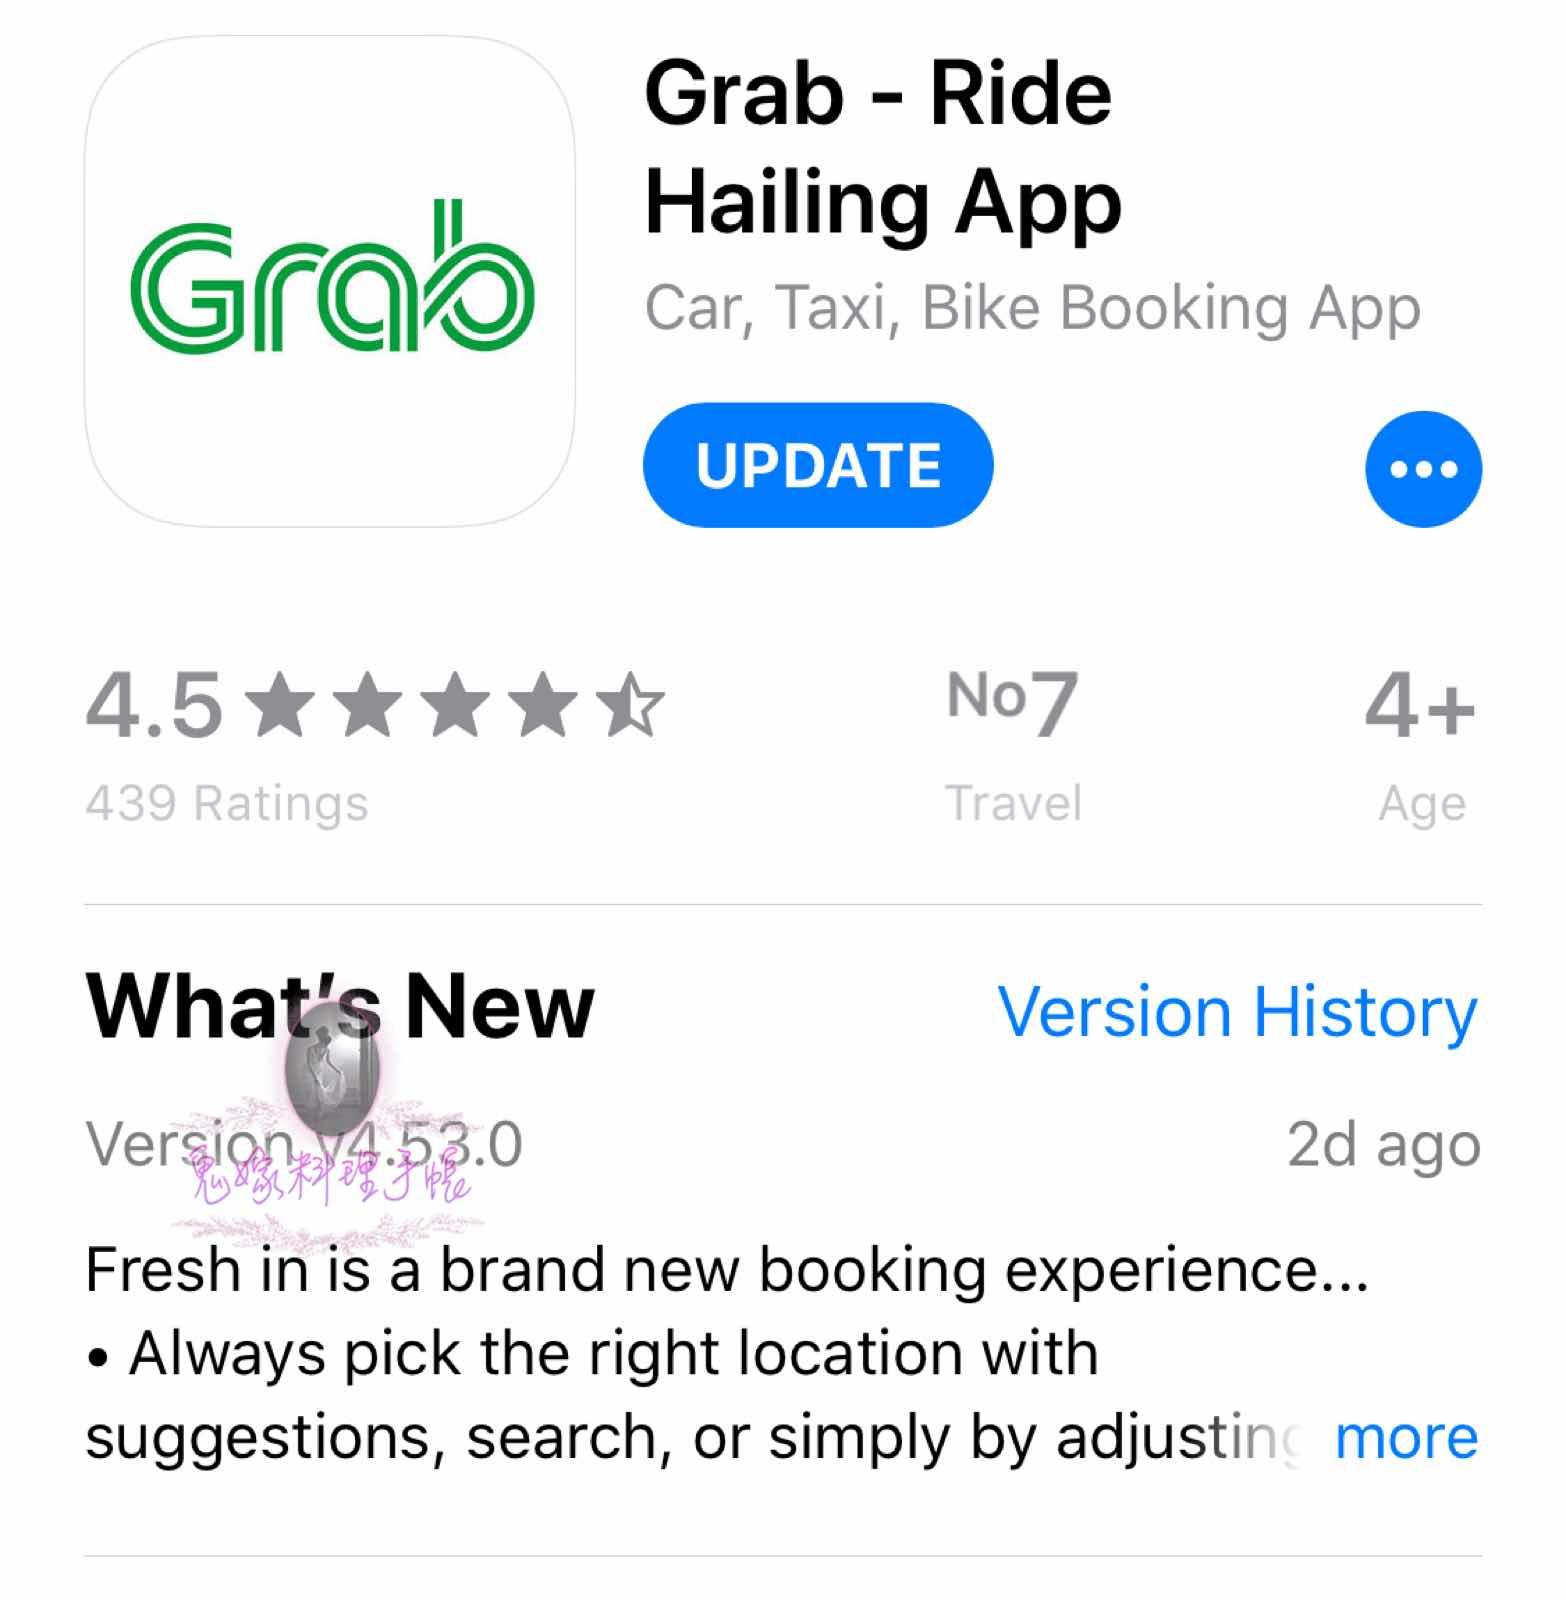 鬼嫁料理手帳: Grab Taxi - 曼谷,芭堤雅,華欣 Call 車 App (附 Promo Code)